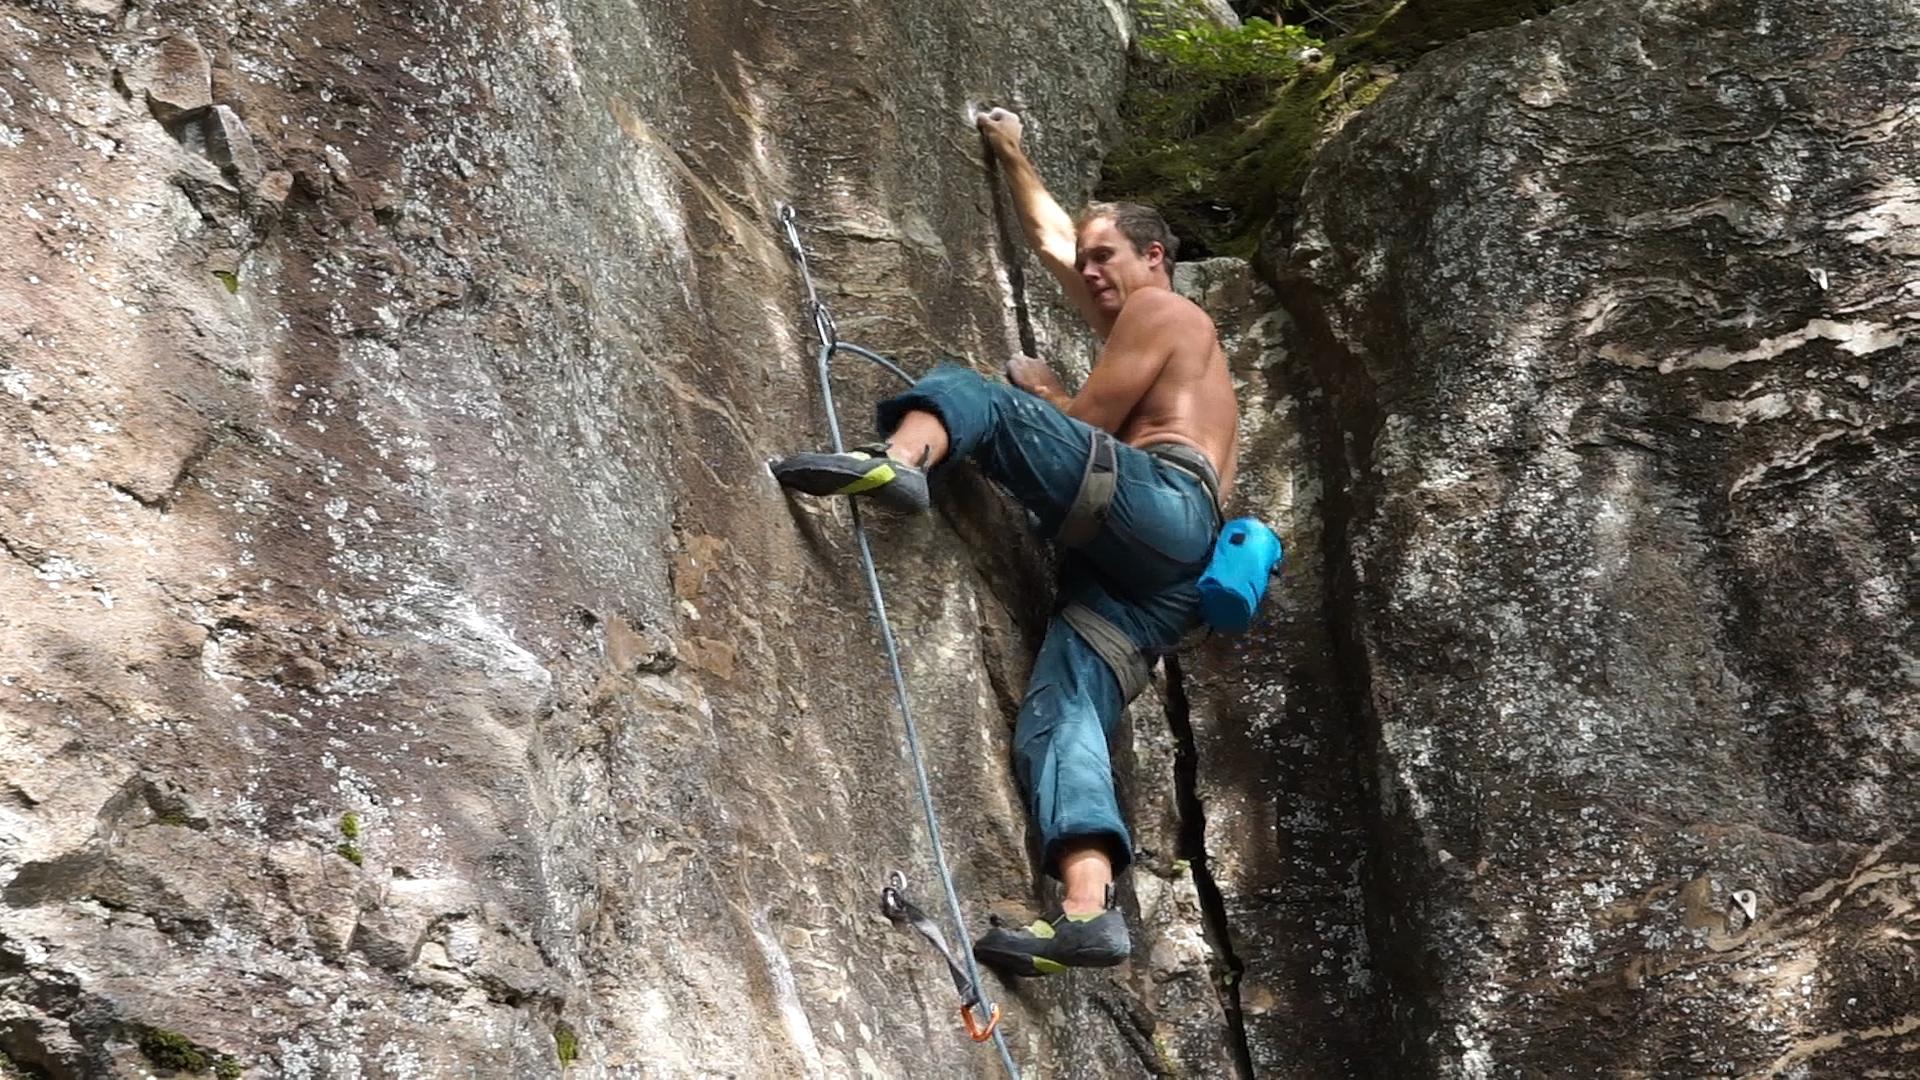 Xtend and climb pro crescent mechanics tool set